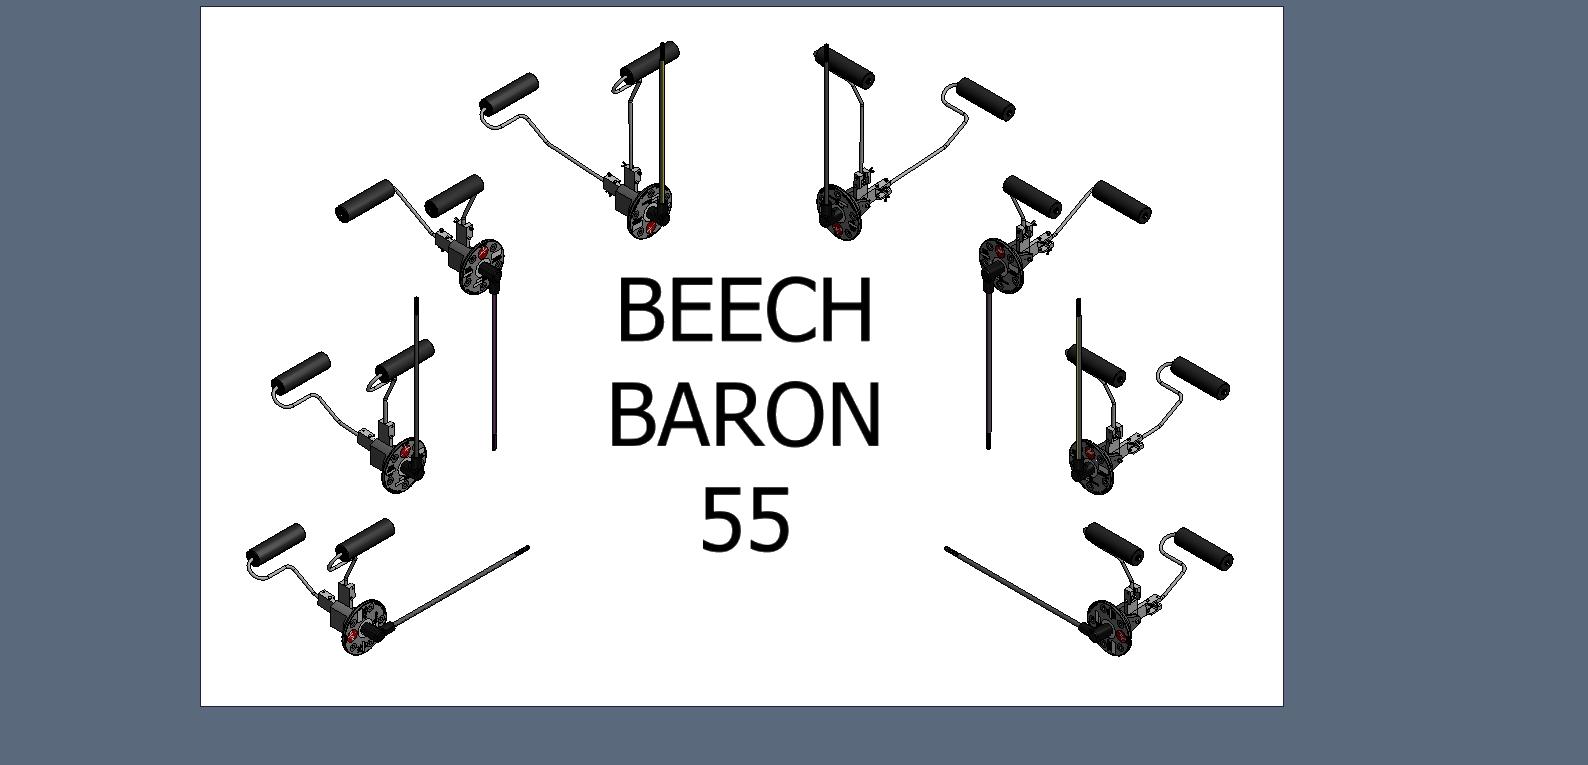 beechcraft baron b55